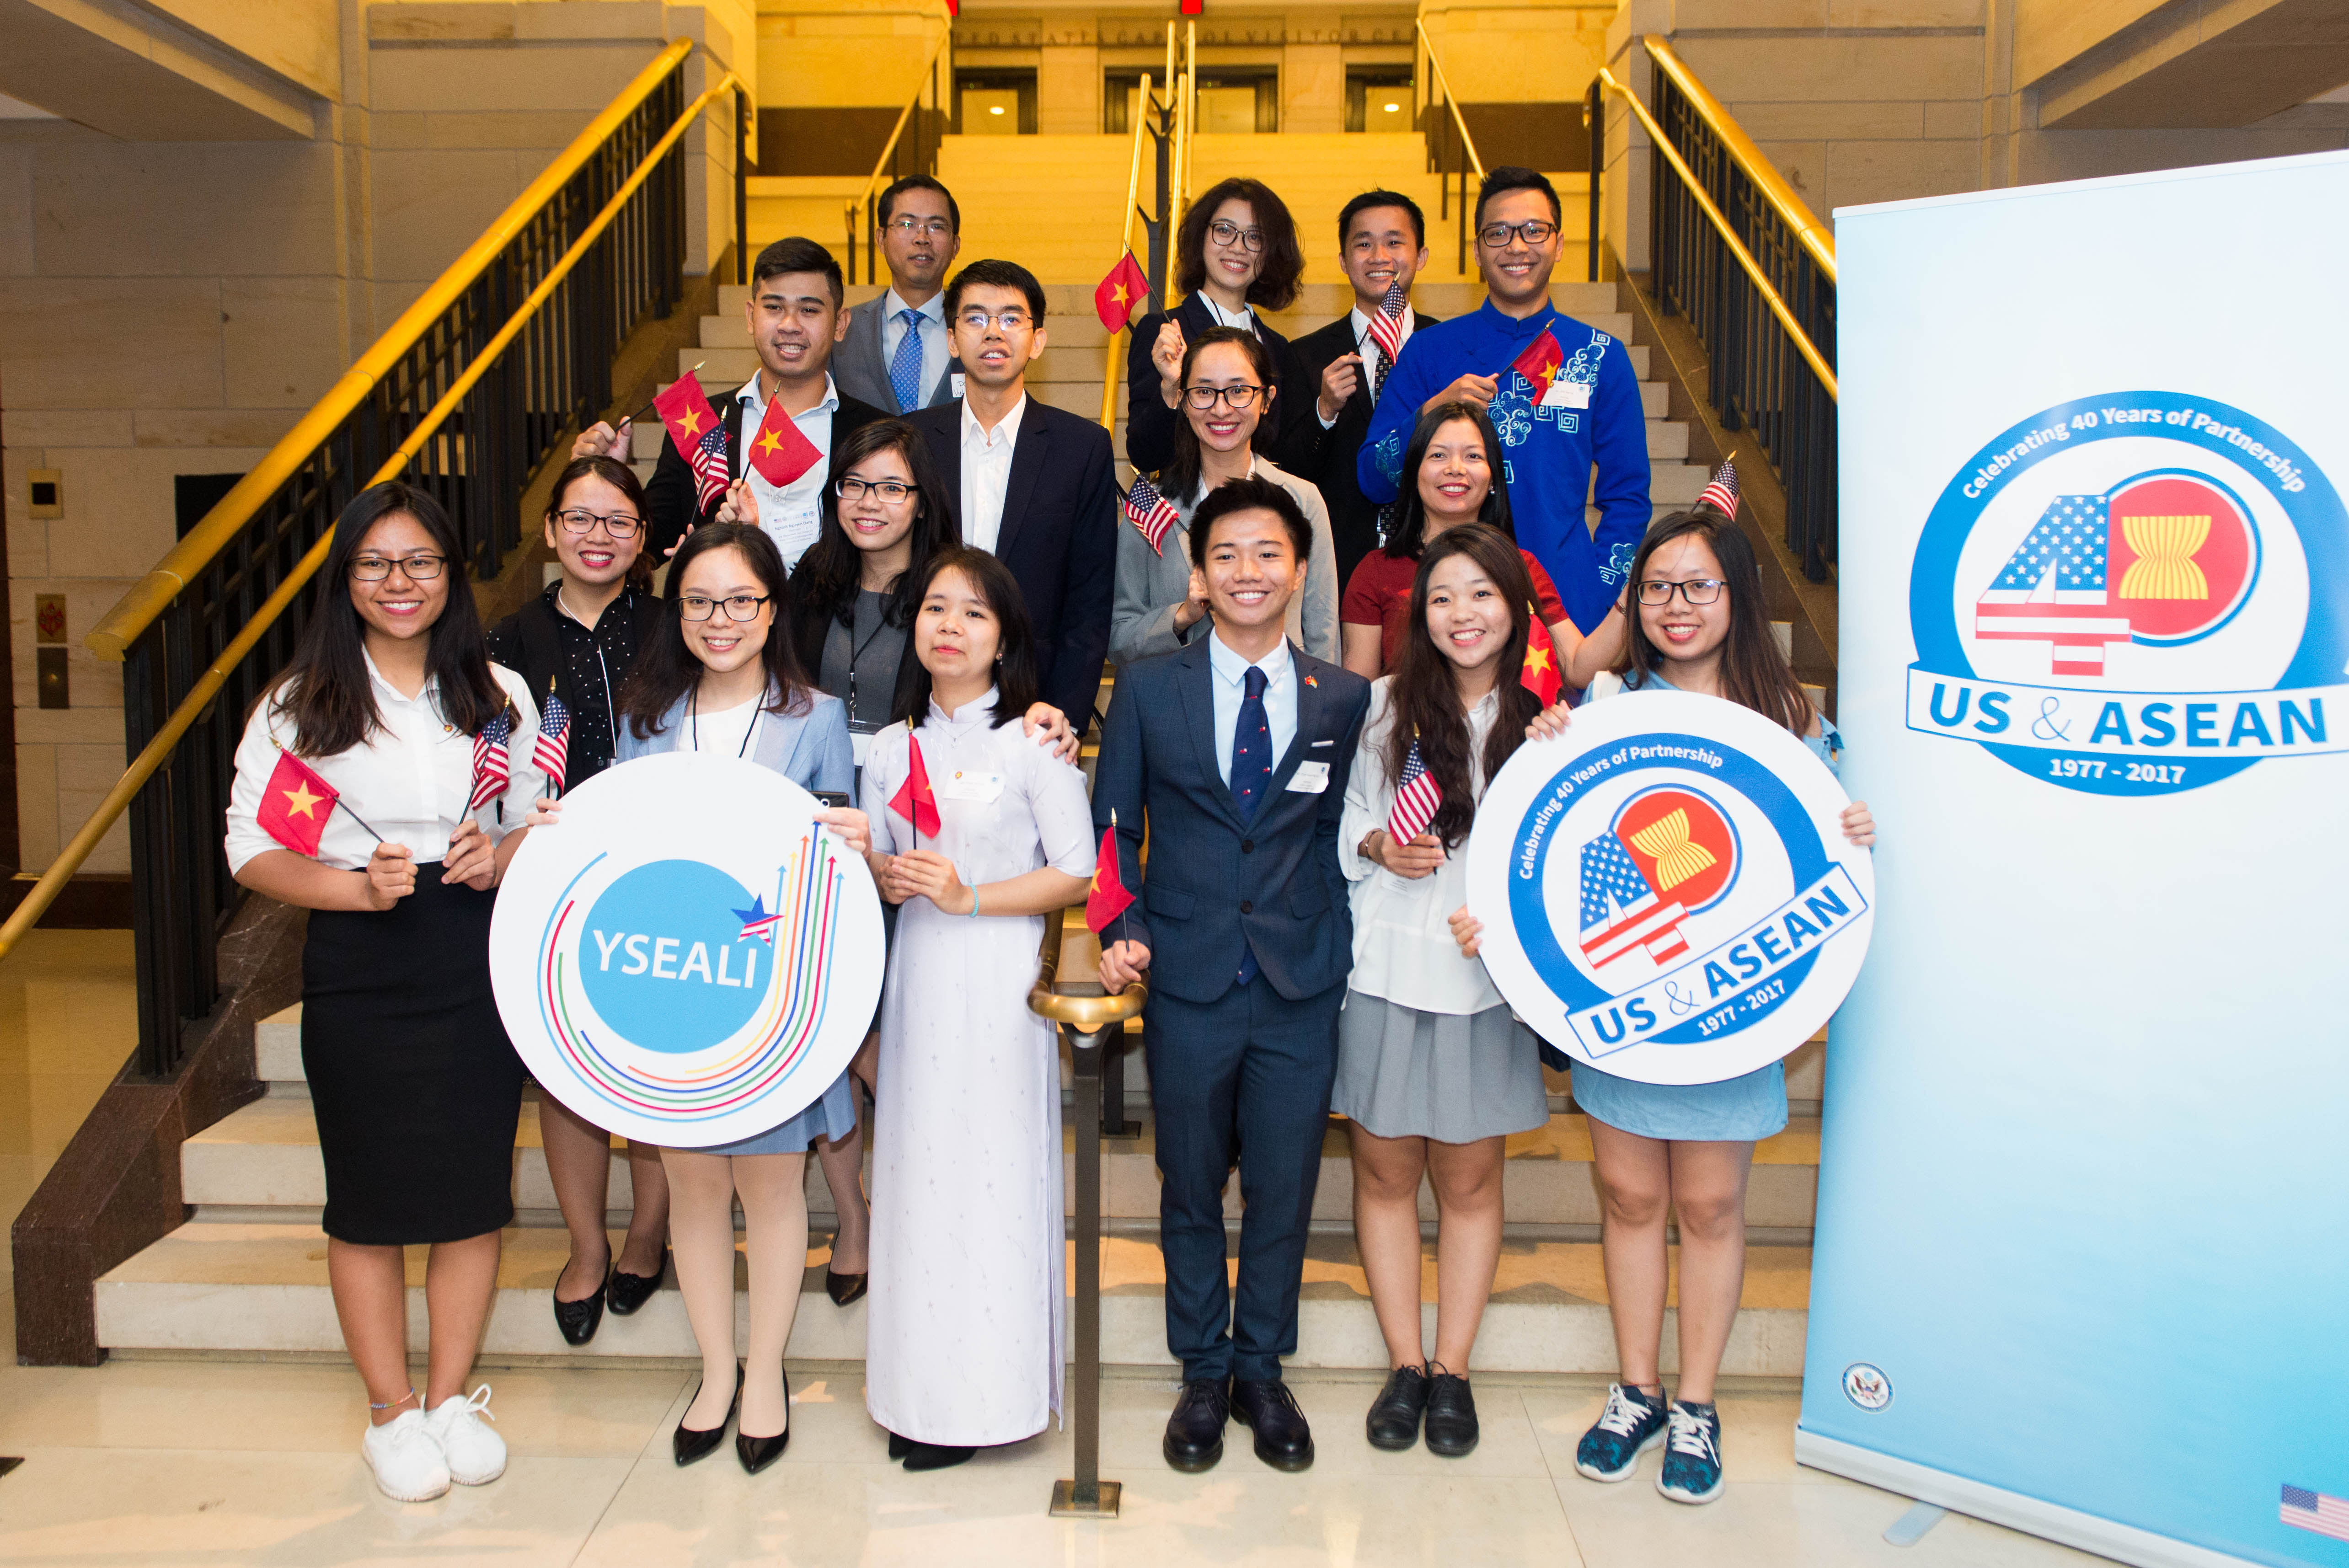 Kỷ niệm 40 năm quan hệ ngoại giao Hoa Kỳ - ASEAN